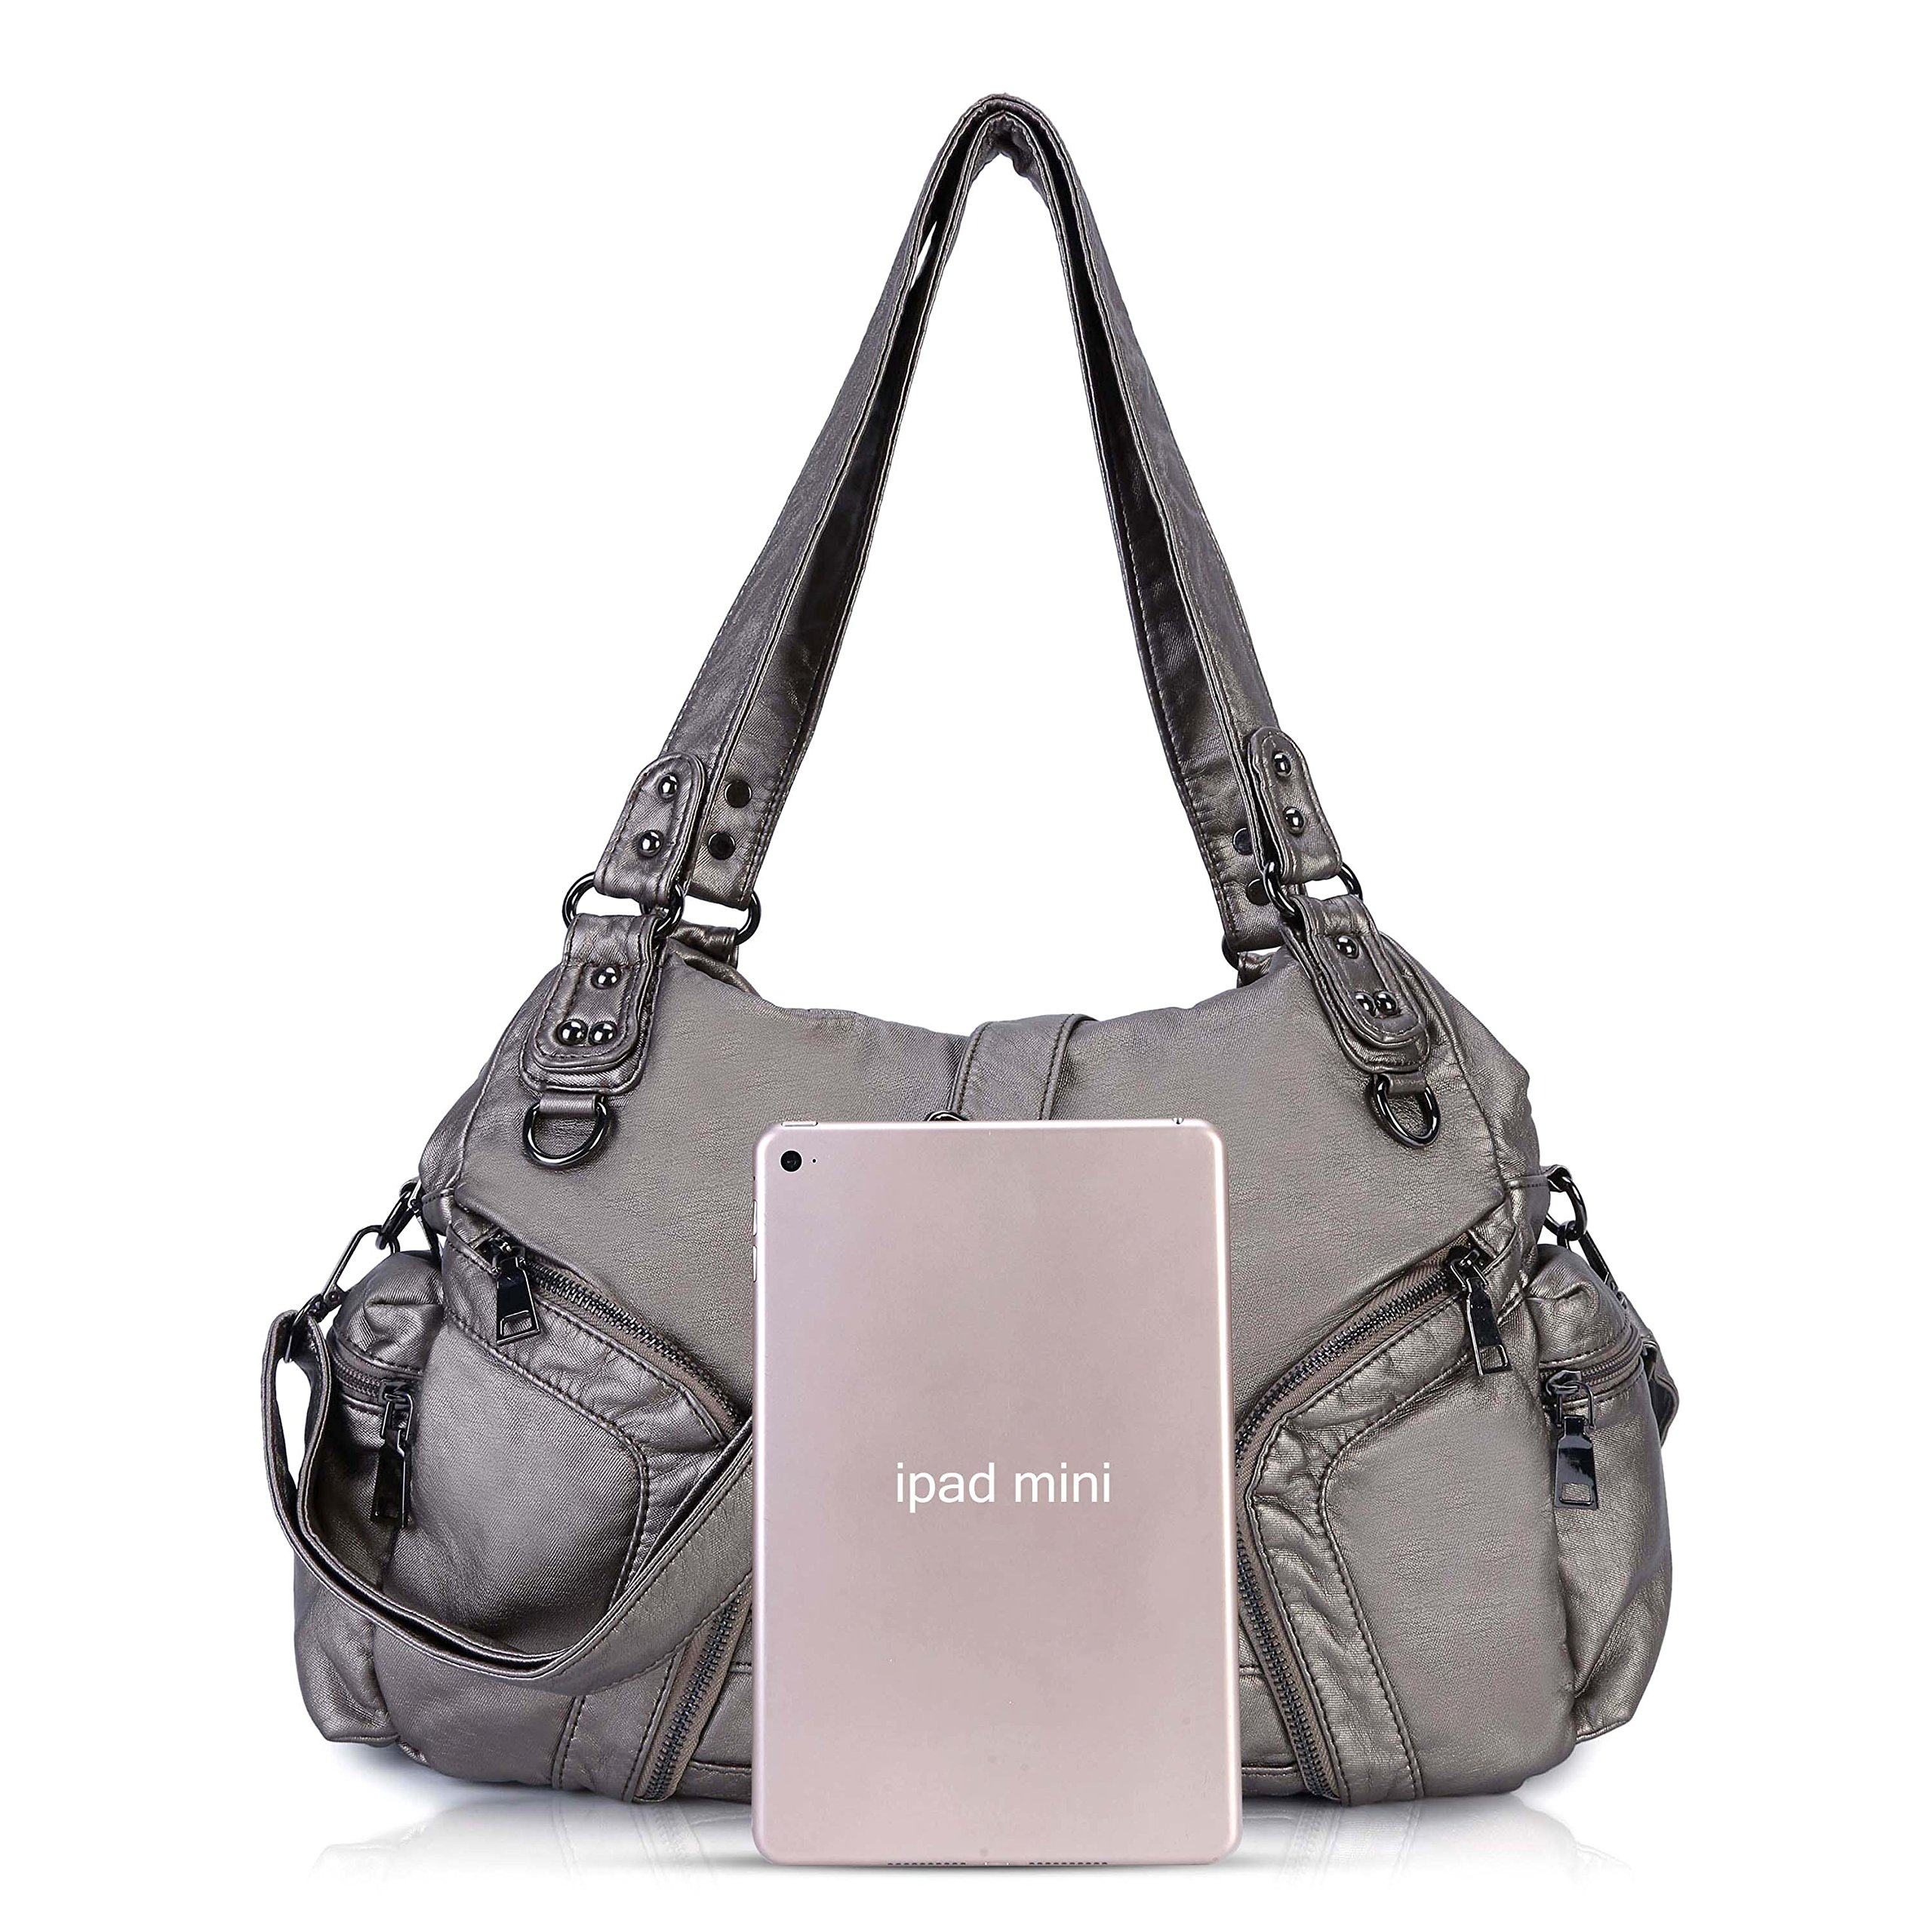 Women Handbag Soft Leather Purse Large Capacity Tote Bag Crossbody Shoulder Bag for Ladies (#SILVER)